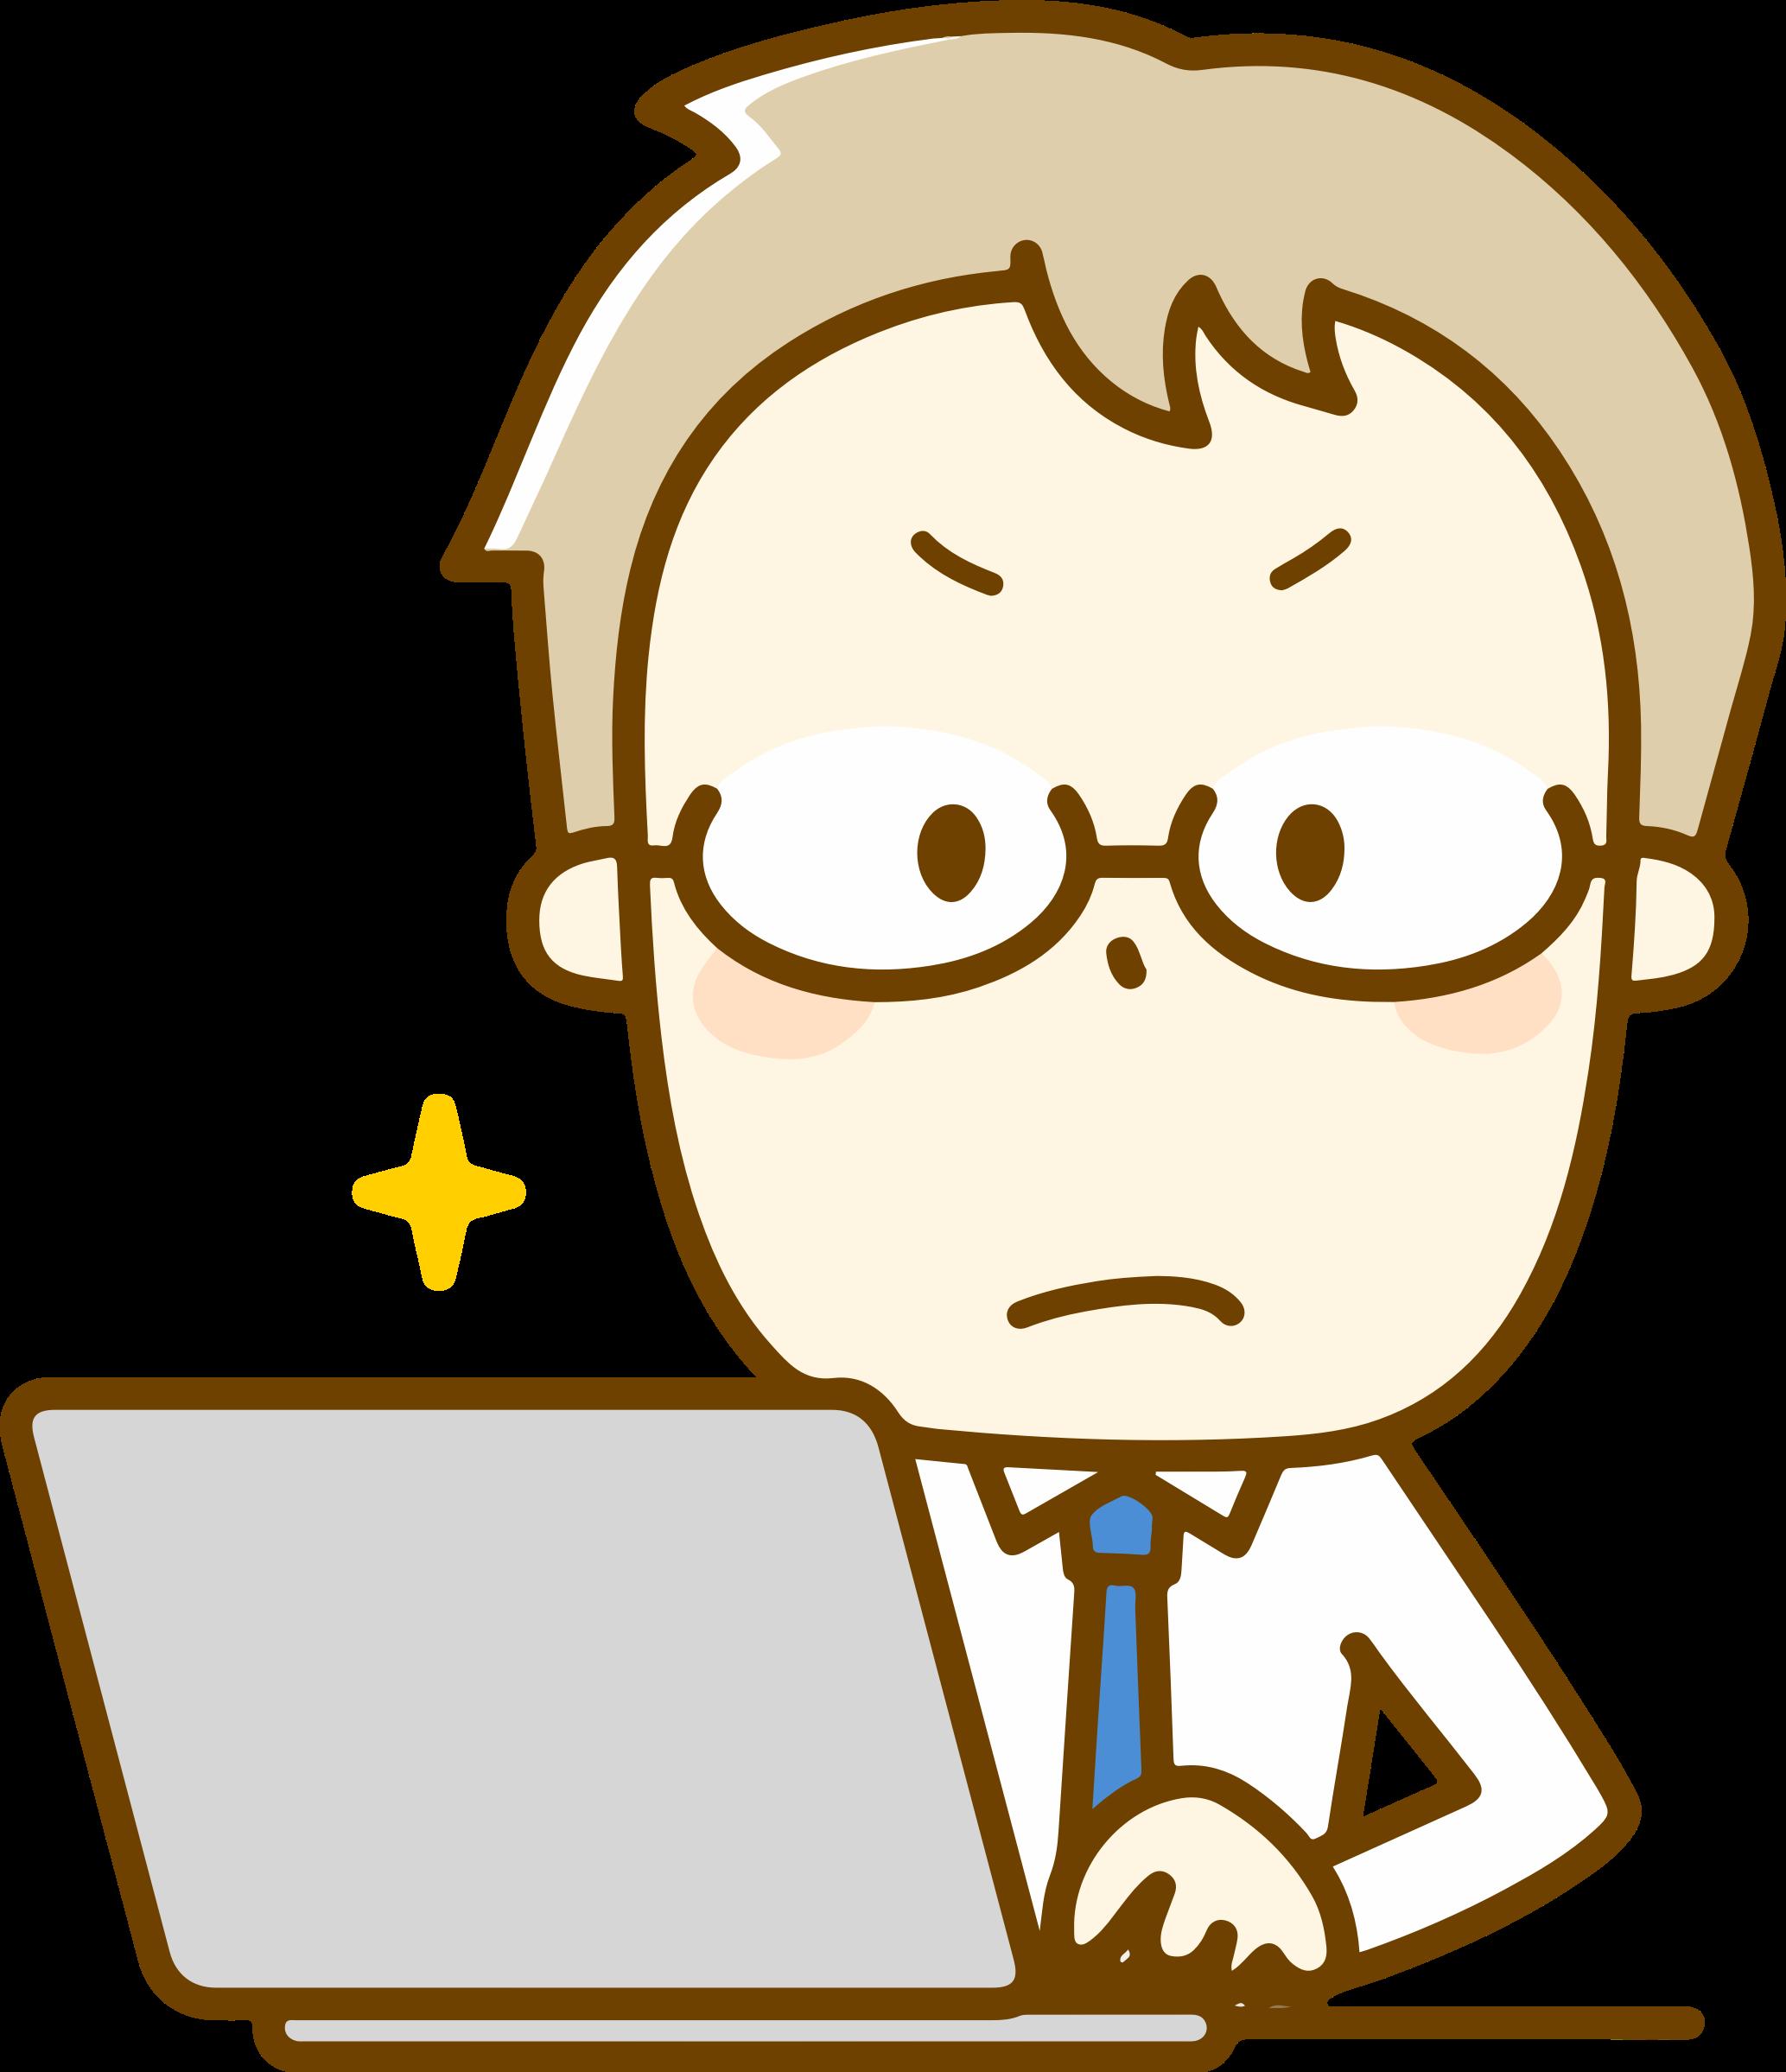 Male Computer User (#13)Clipart - Male Computer User (#13) - 웹